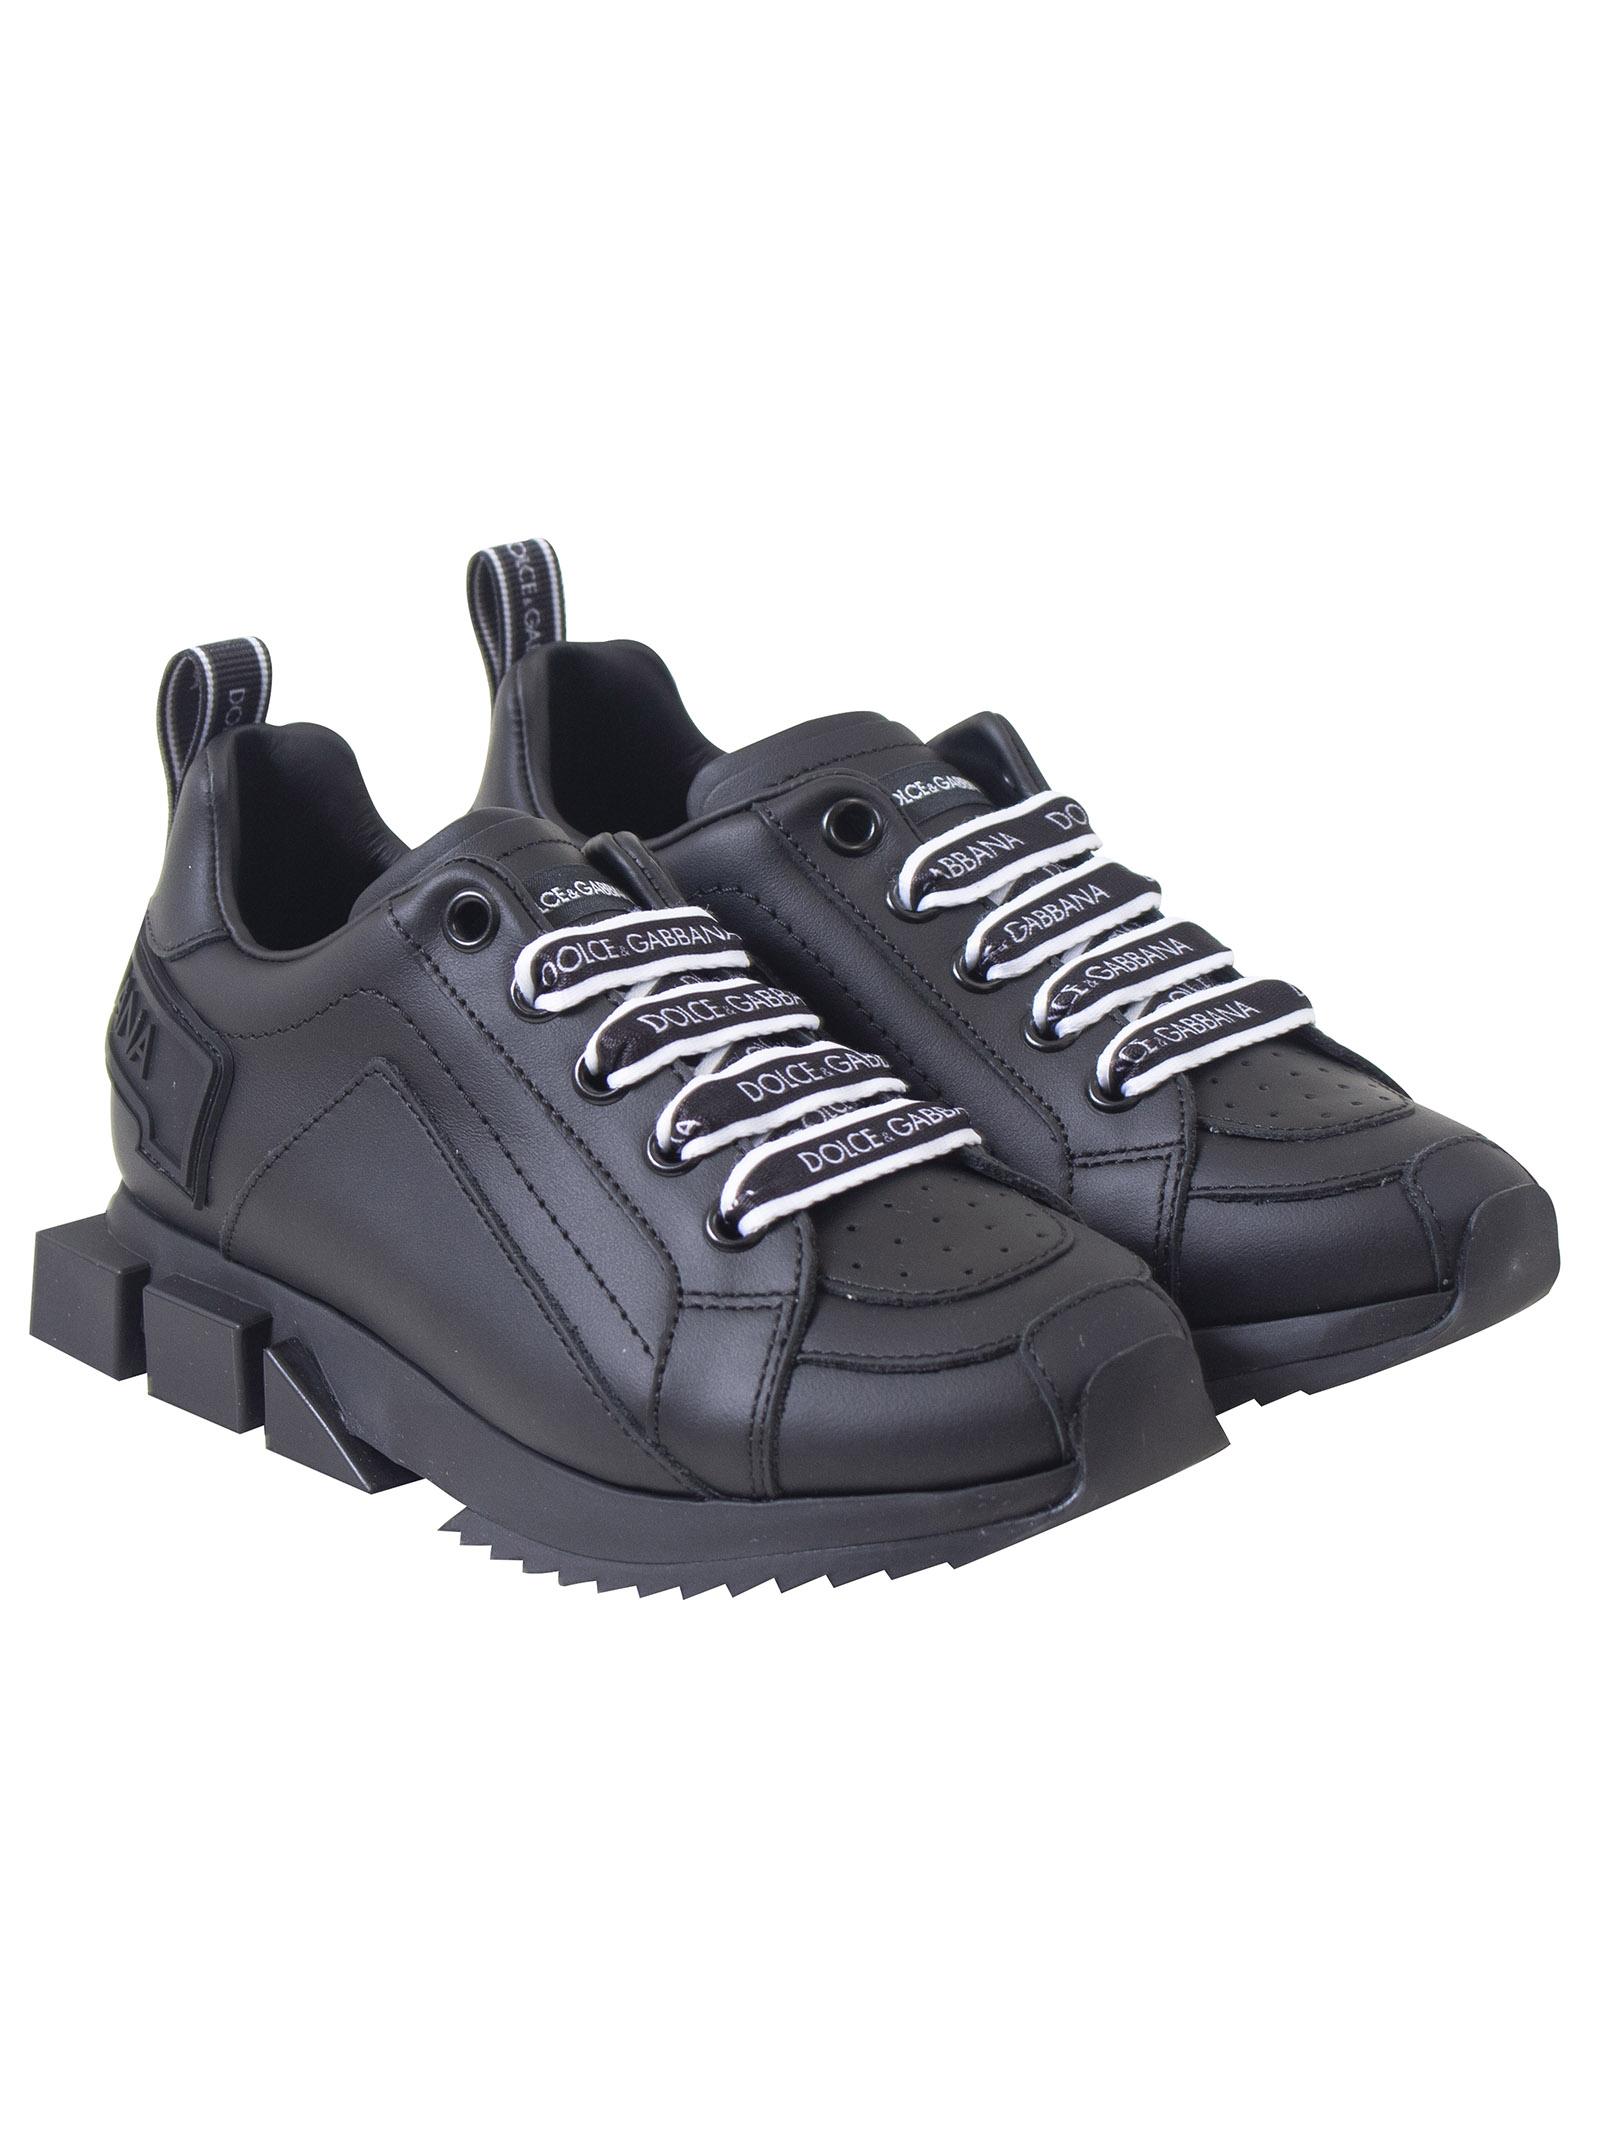 Child sneakers - DOLCE \u0026 GABBANA KIDS